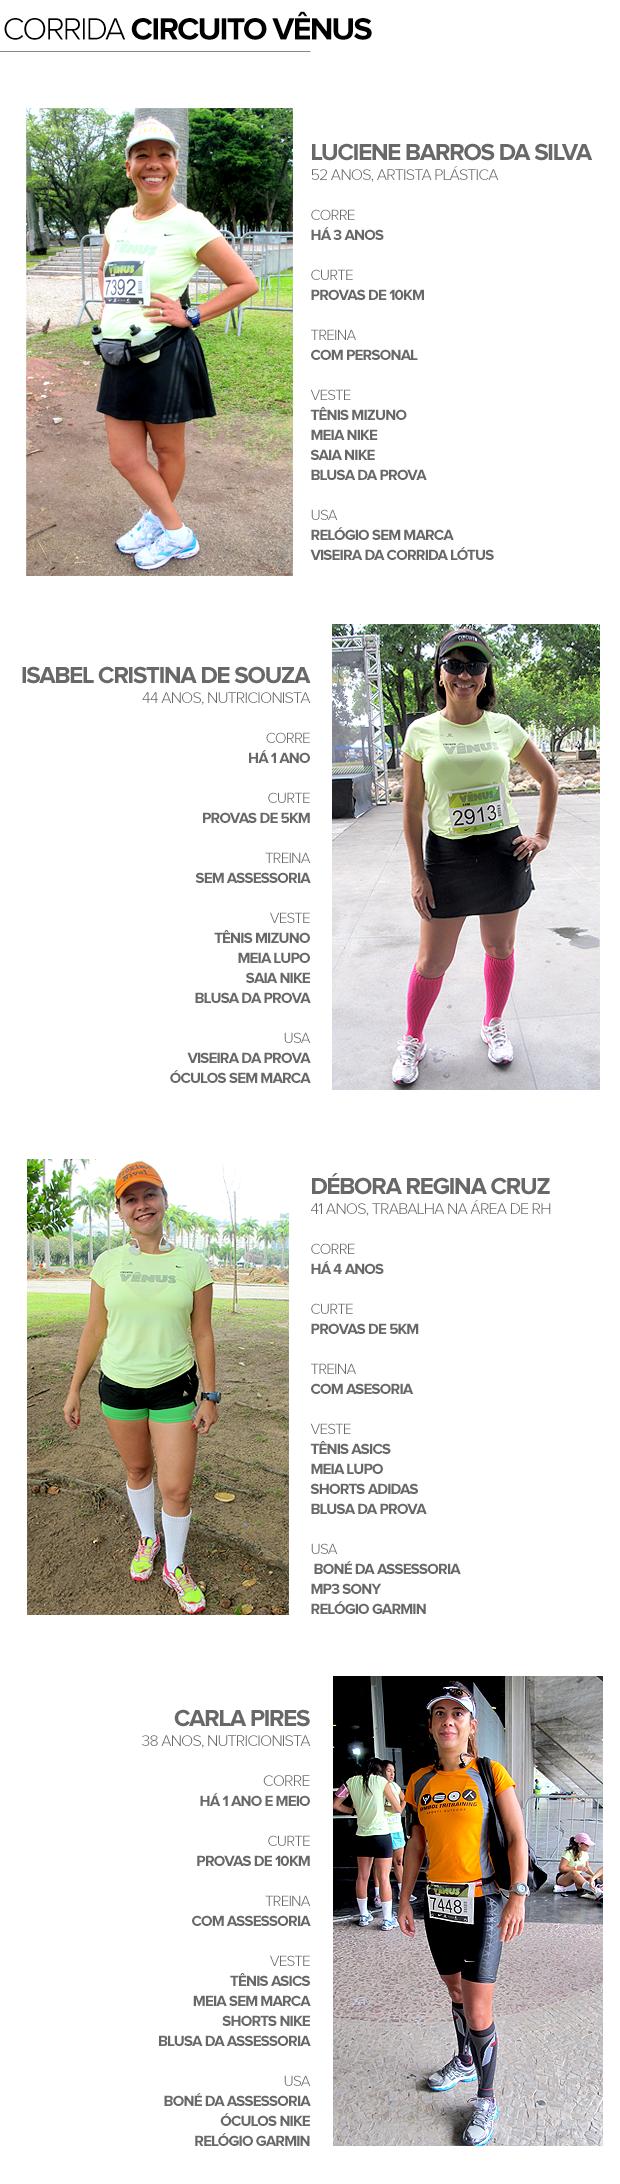 Eu Atleta Estilo Corrida Circuito Vênus (Foto: Editoria de Arte / Globoesporte.com)